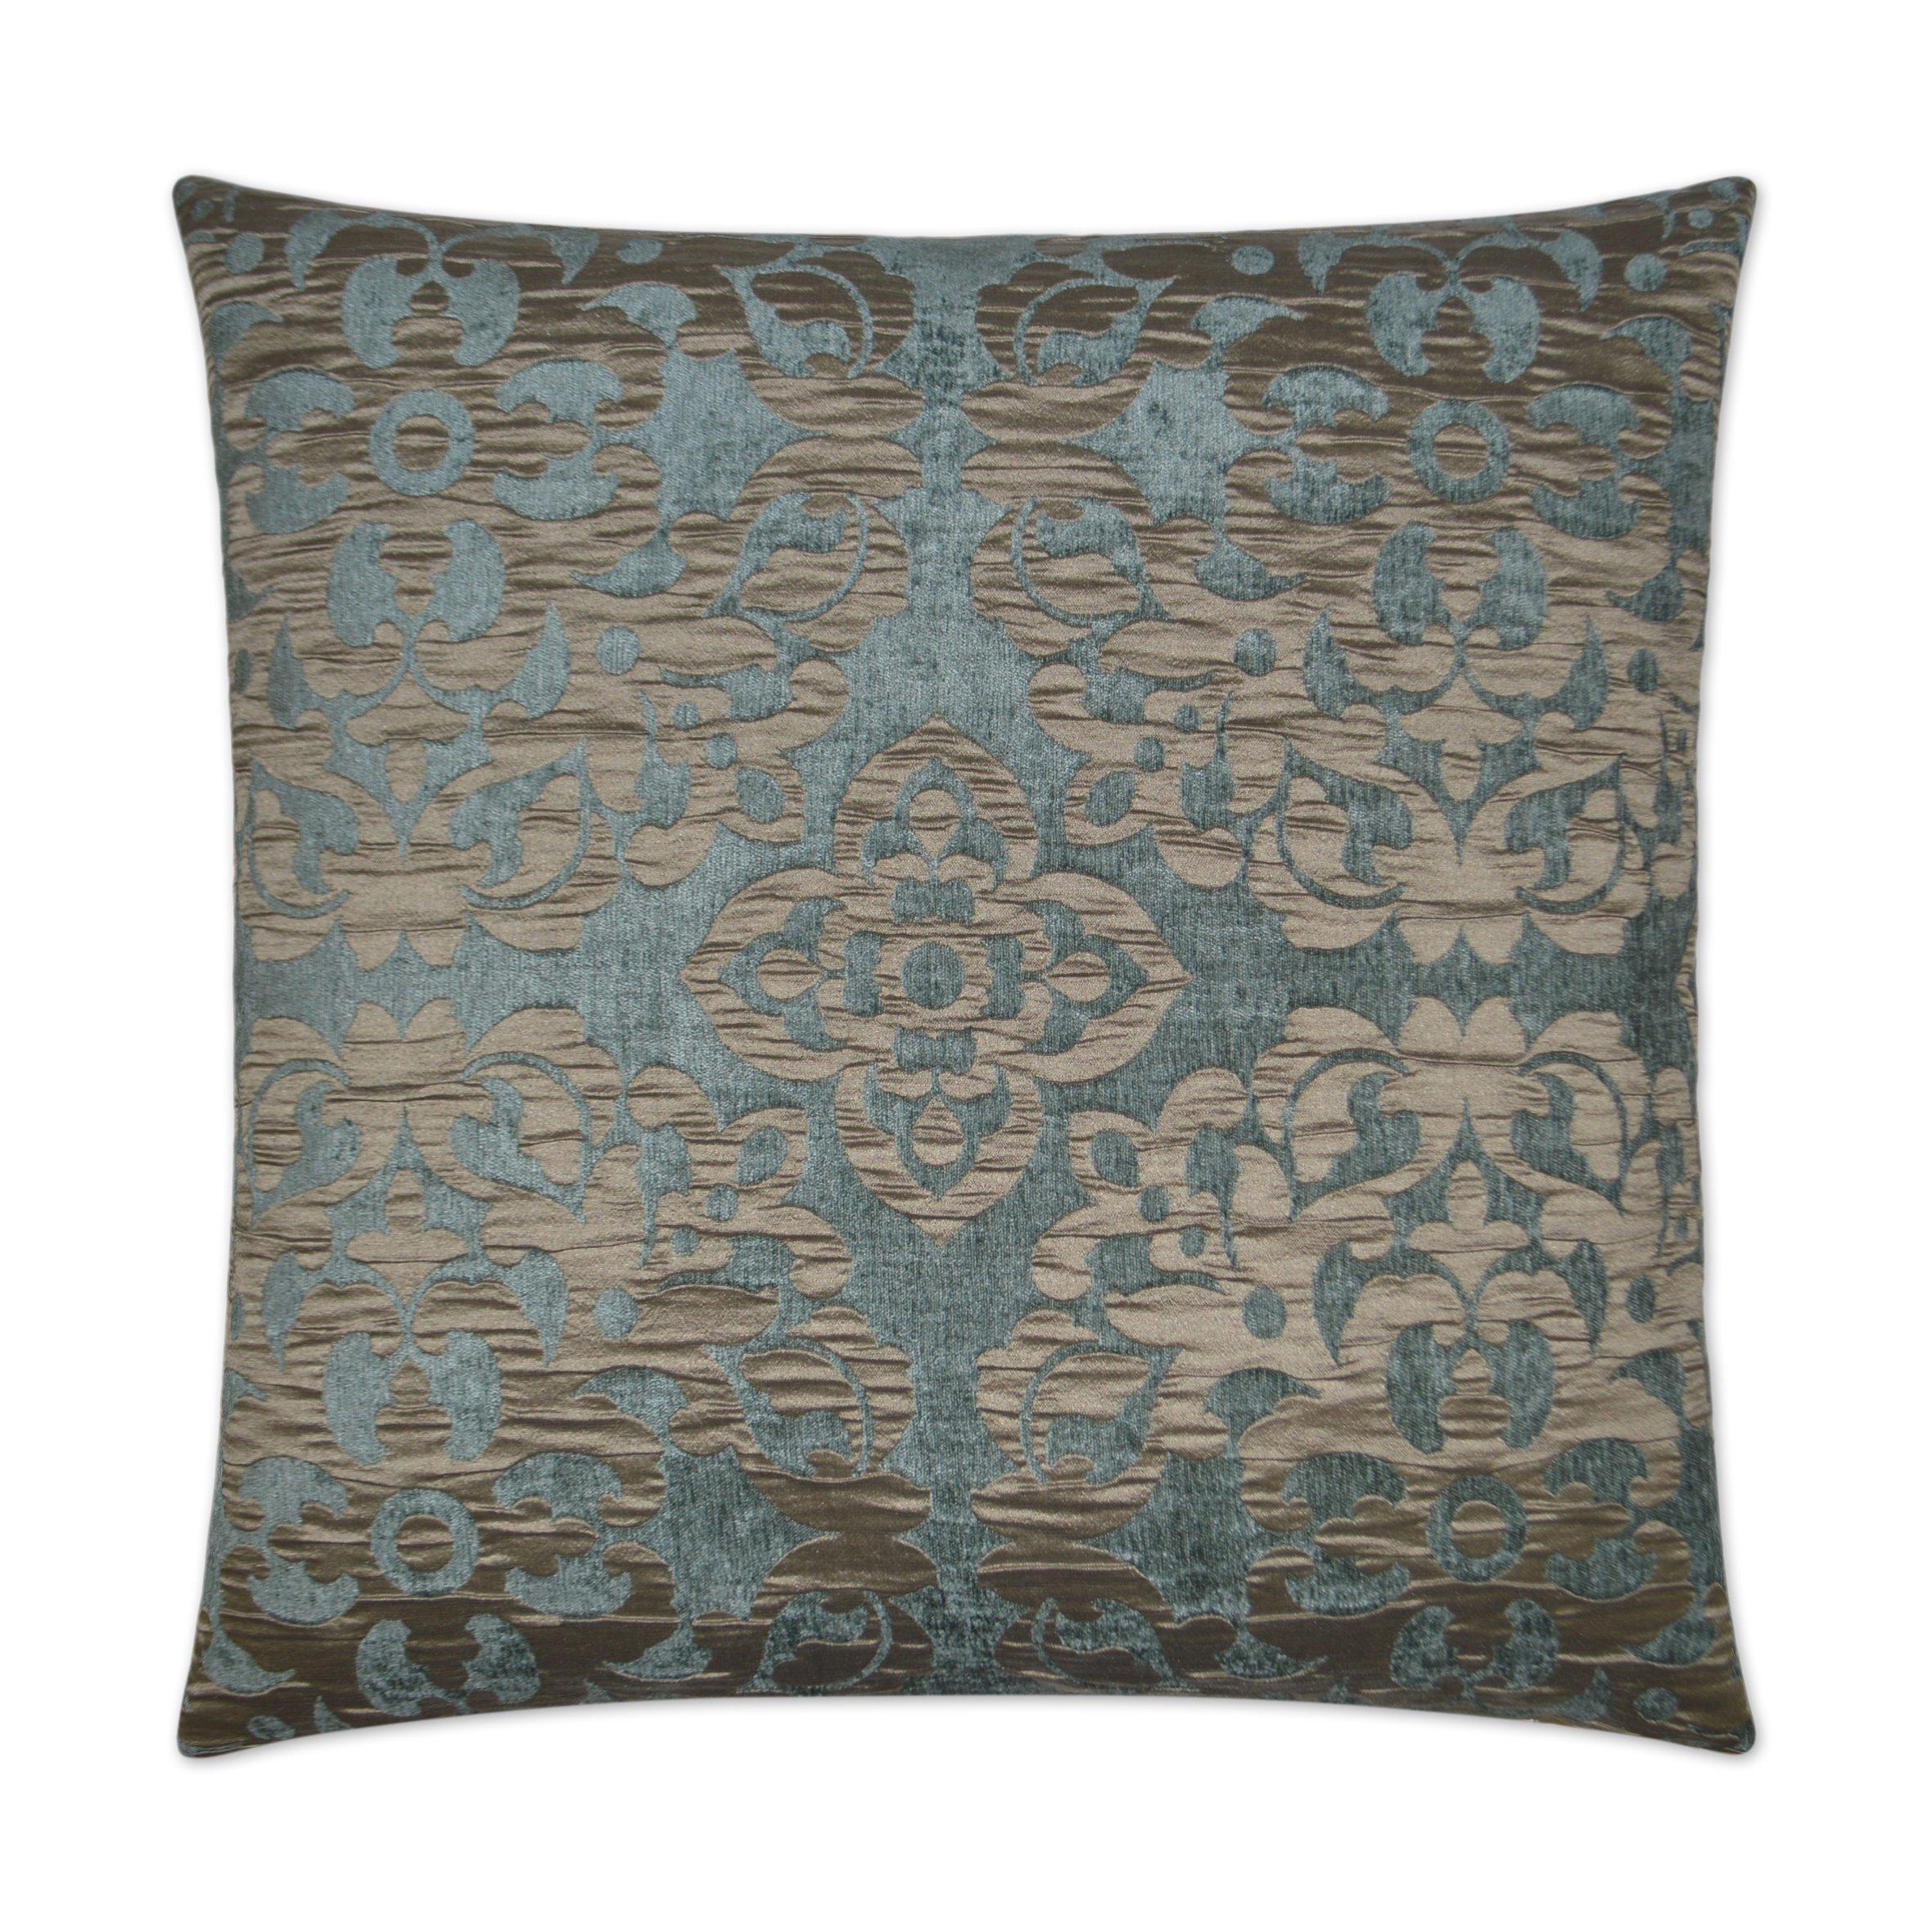 Canaan Company Decorative Pillow Van Ness Studio 2550-S Monte-Spa